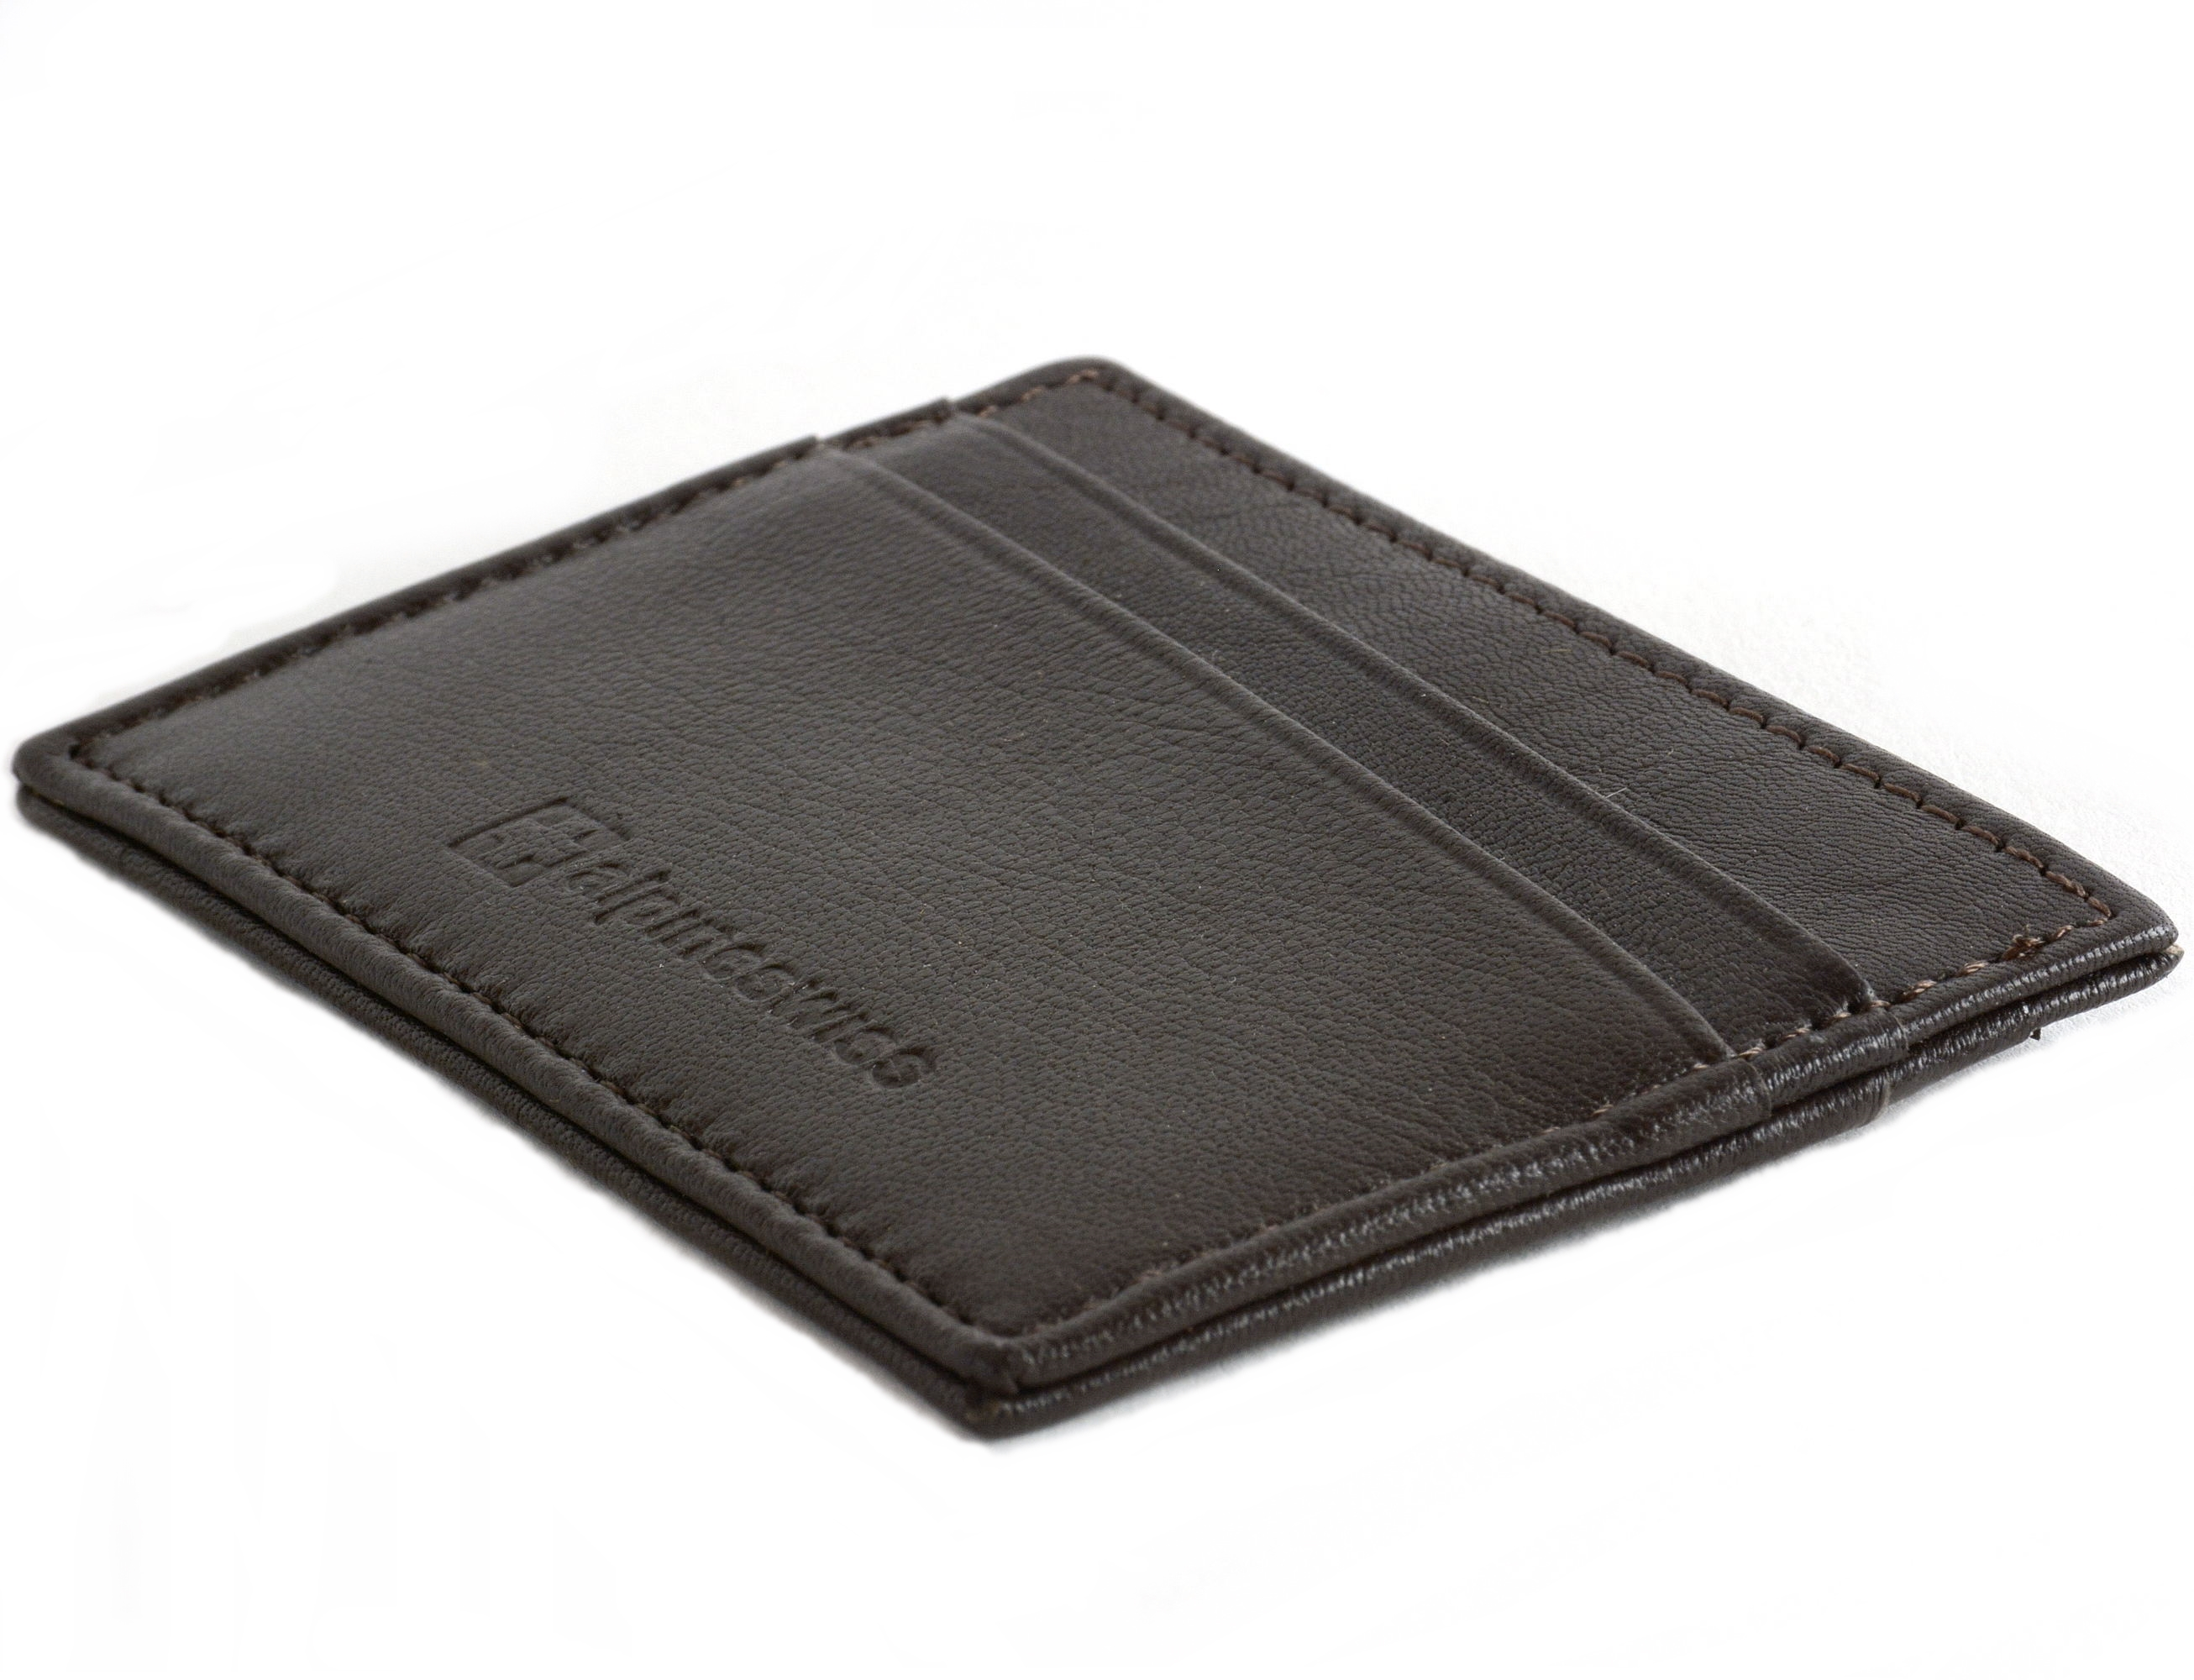 Alpine-Swiss-Minimalist-Leather-Front-Pocket-Wallet-5-Card-Slots-Slim-Thin-Case thumbnail 54